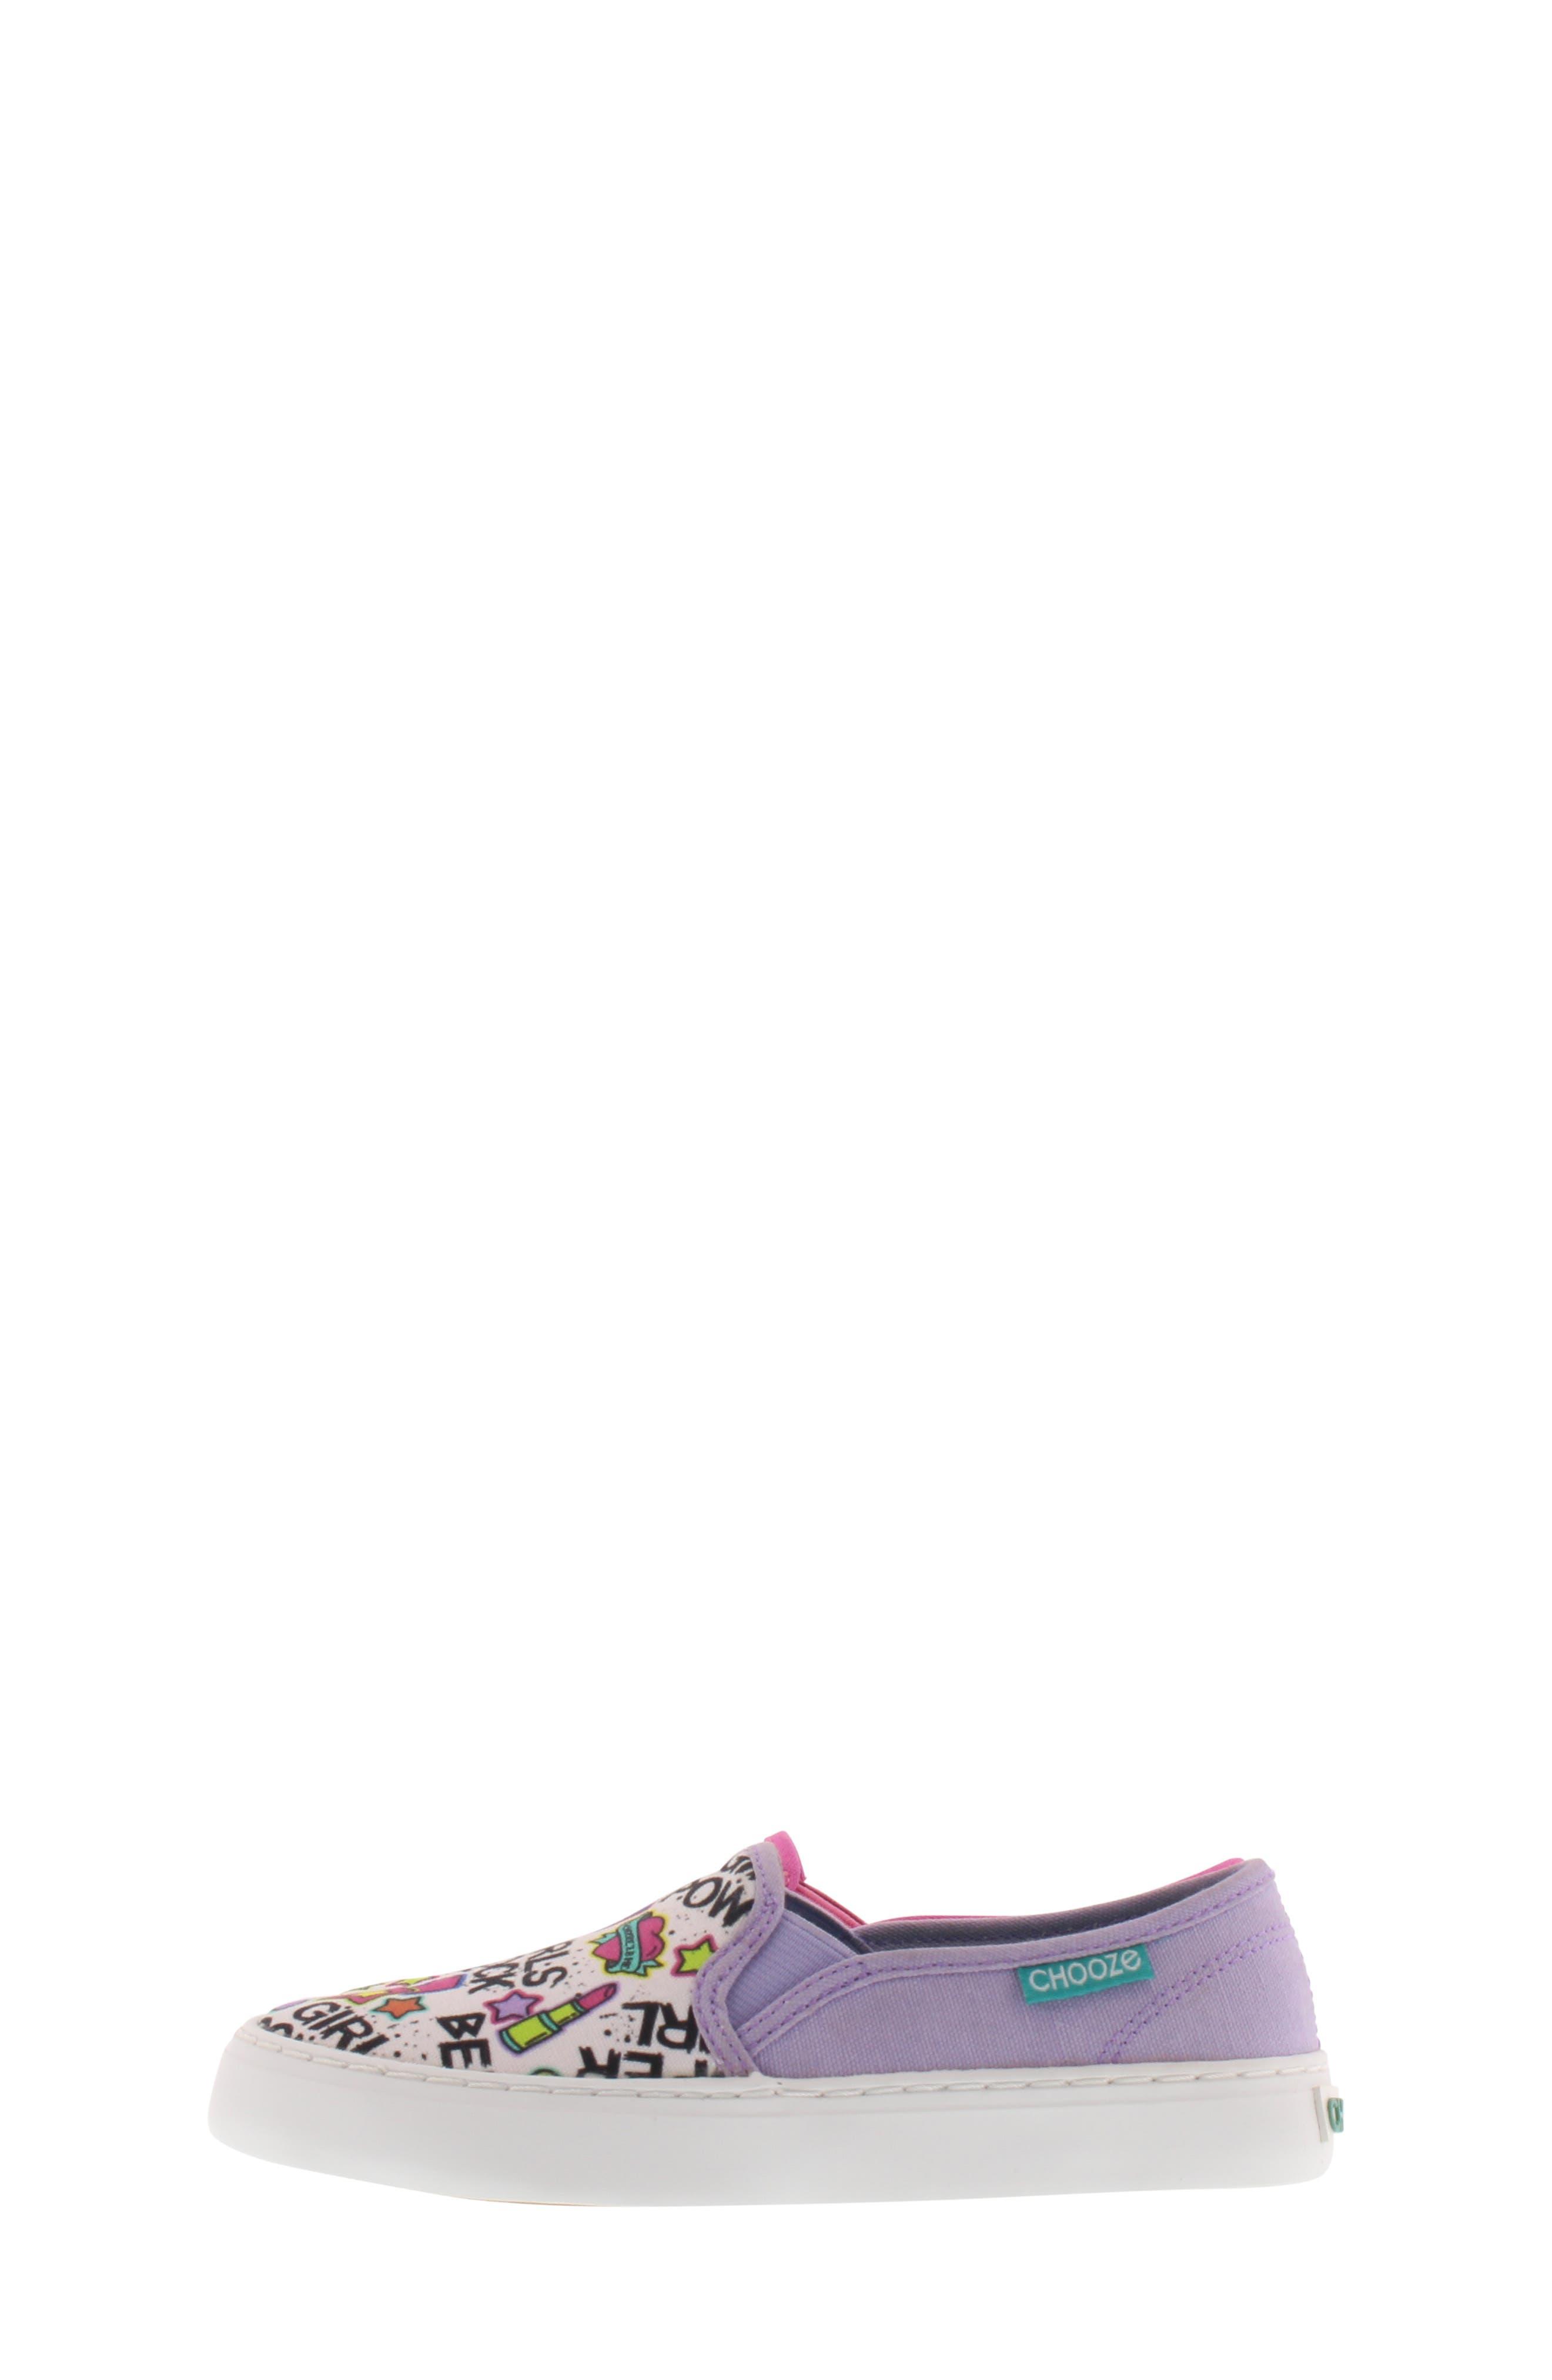 CHOOZE, Move Motion Slip-On Sneaker, Alternate thumbnail 9, color, PINK LAVENDER